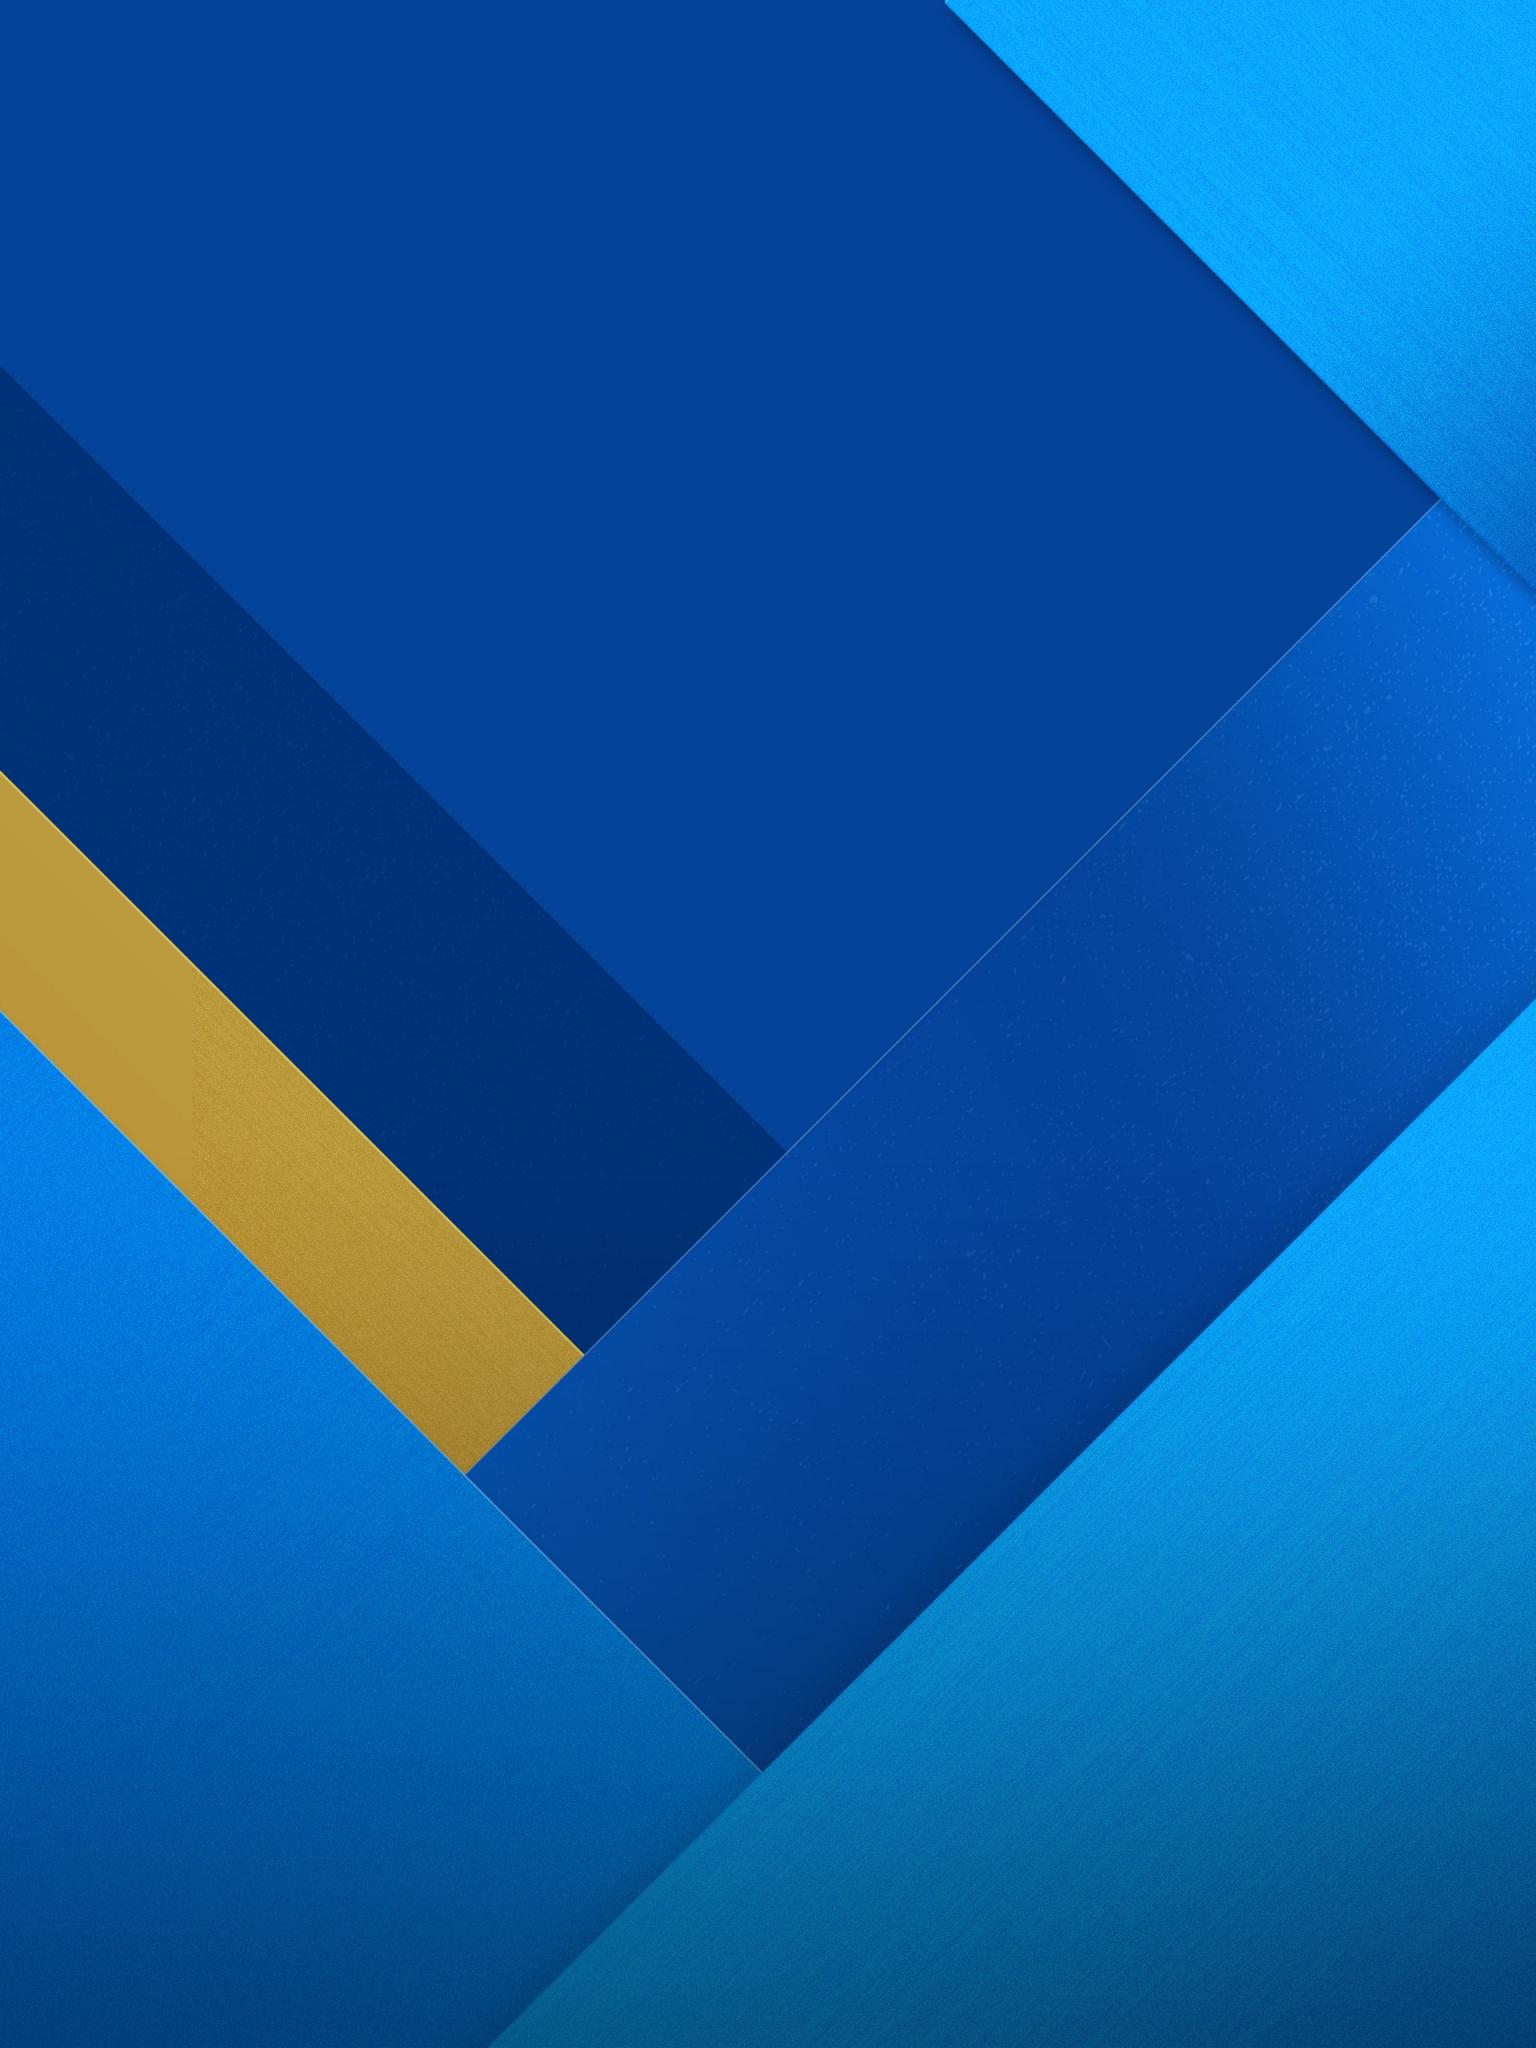 Free Download Galaxy S7 Galaxy S7 Edge Galaxy S7 Edge Leak Galaxy S7 Edge Wallpaper 2560x2560 For Your Desktop Mobile Tablet Explore 47 Galaxy S7 Edge Wallpapers Samsung Galaxy